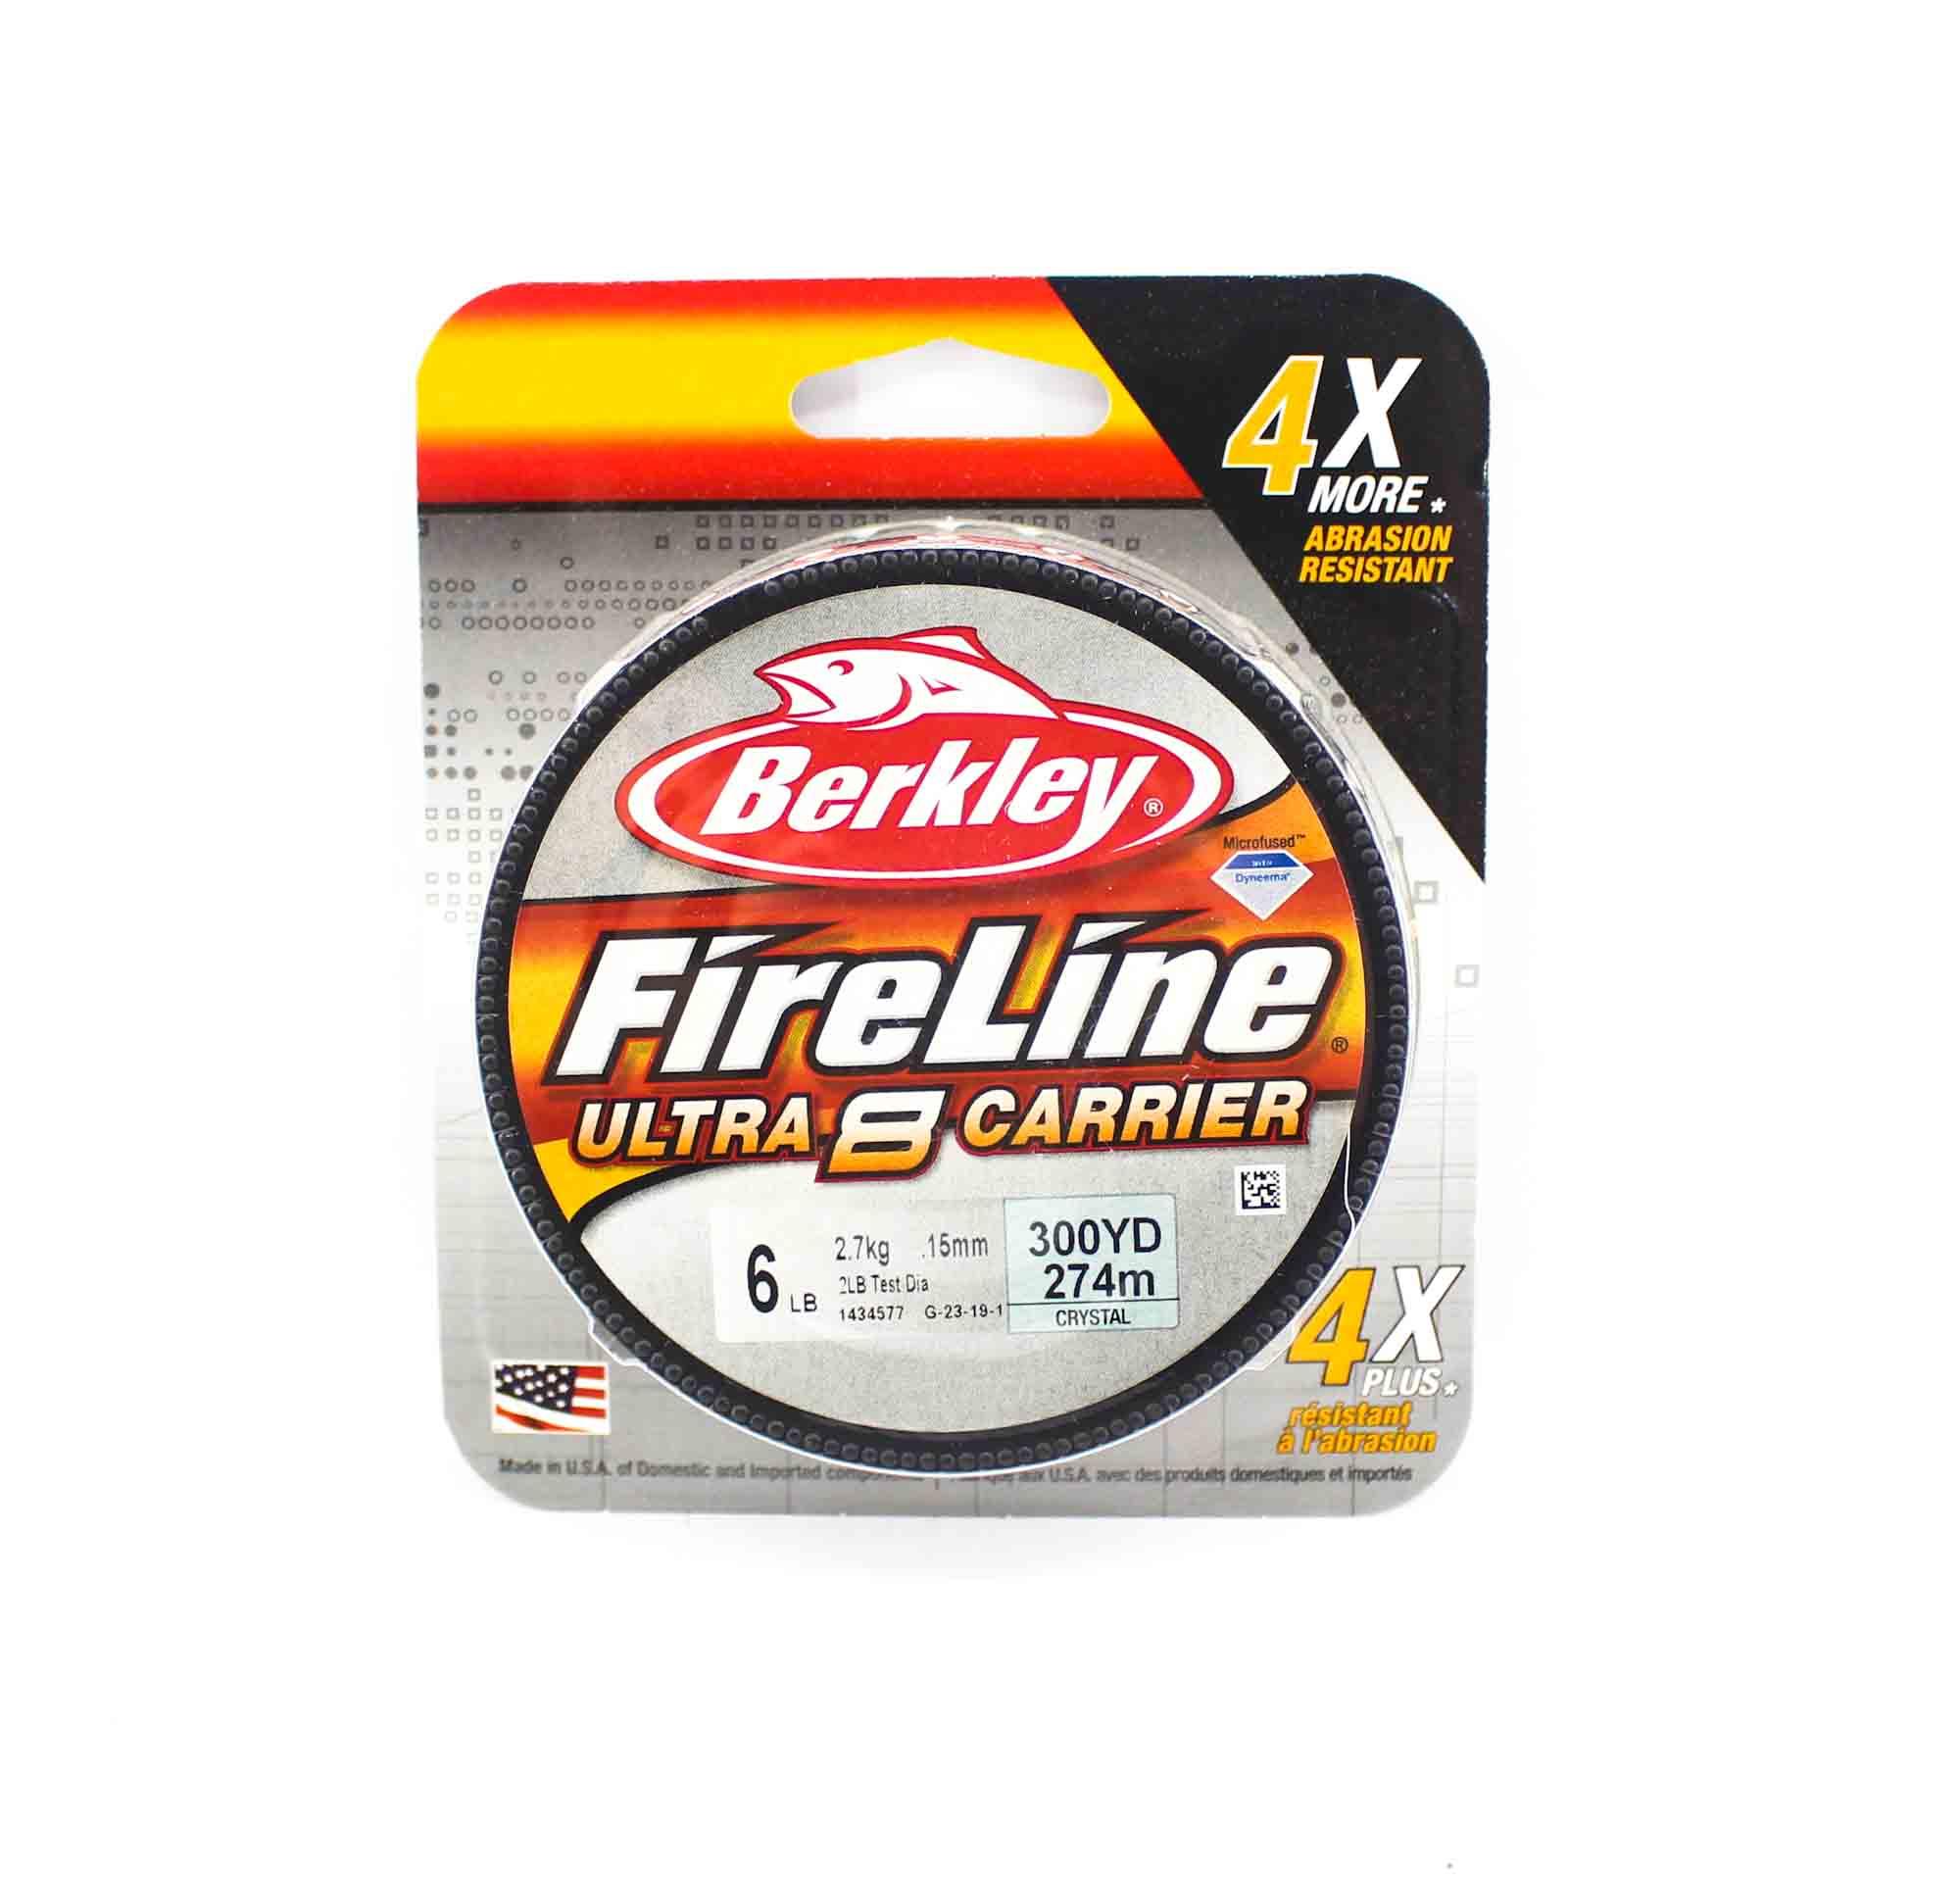 Berkley Fireline Ultra 8 Carrier 300yds 6lb White (4533)